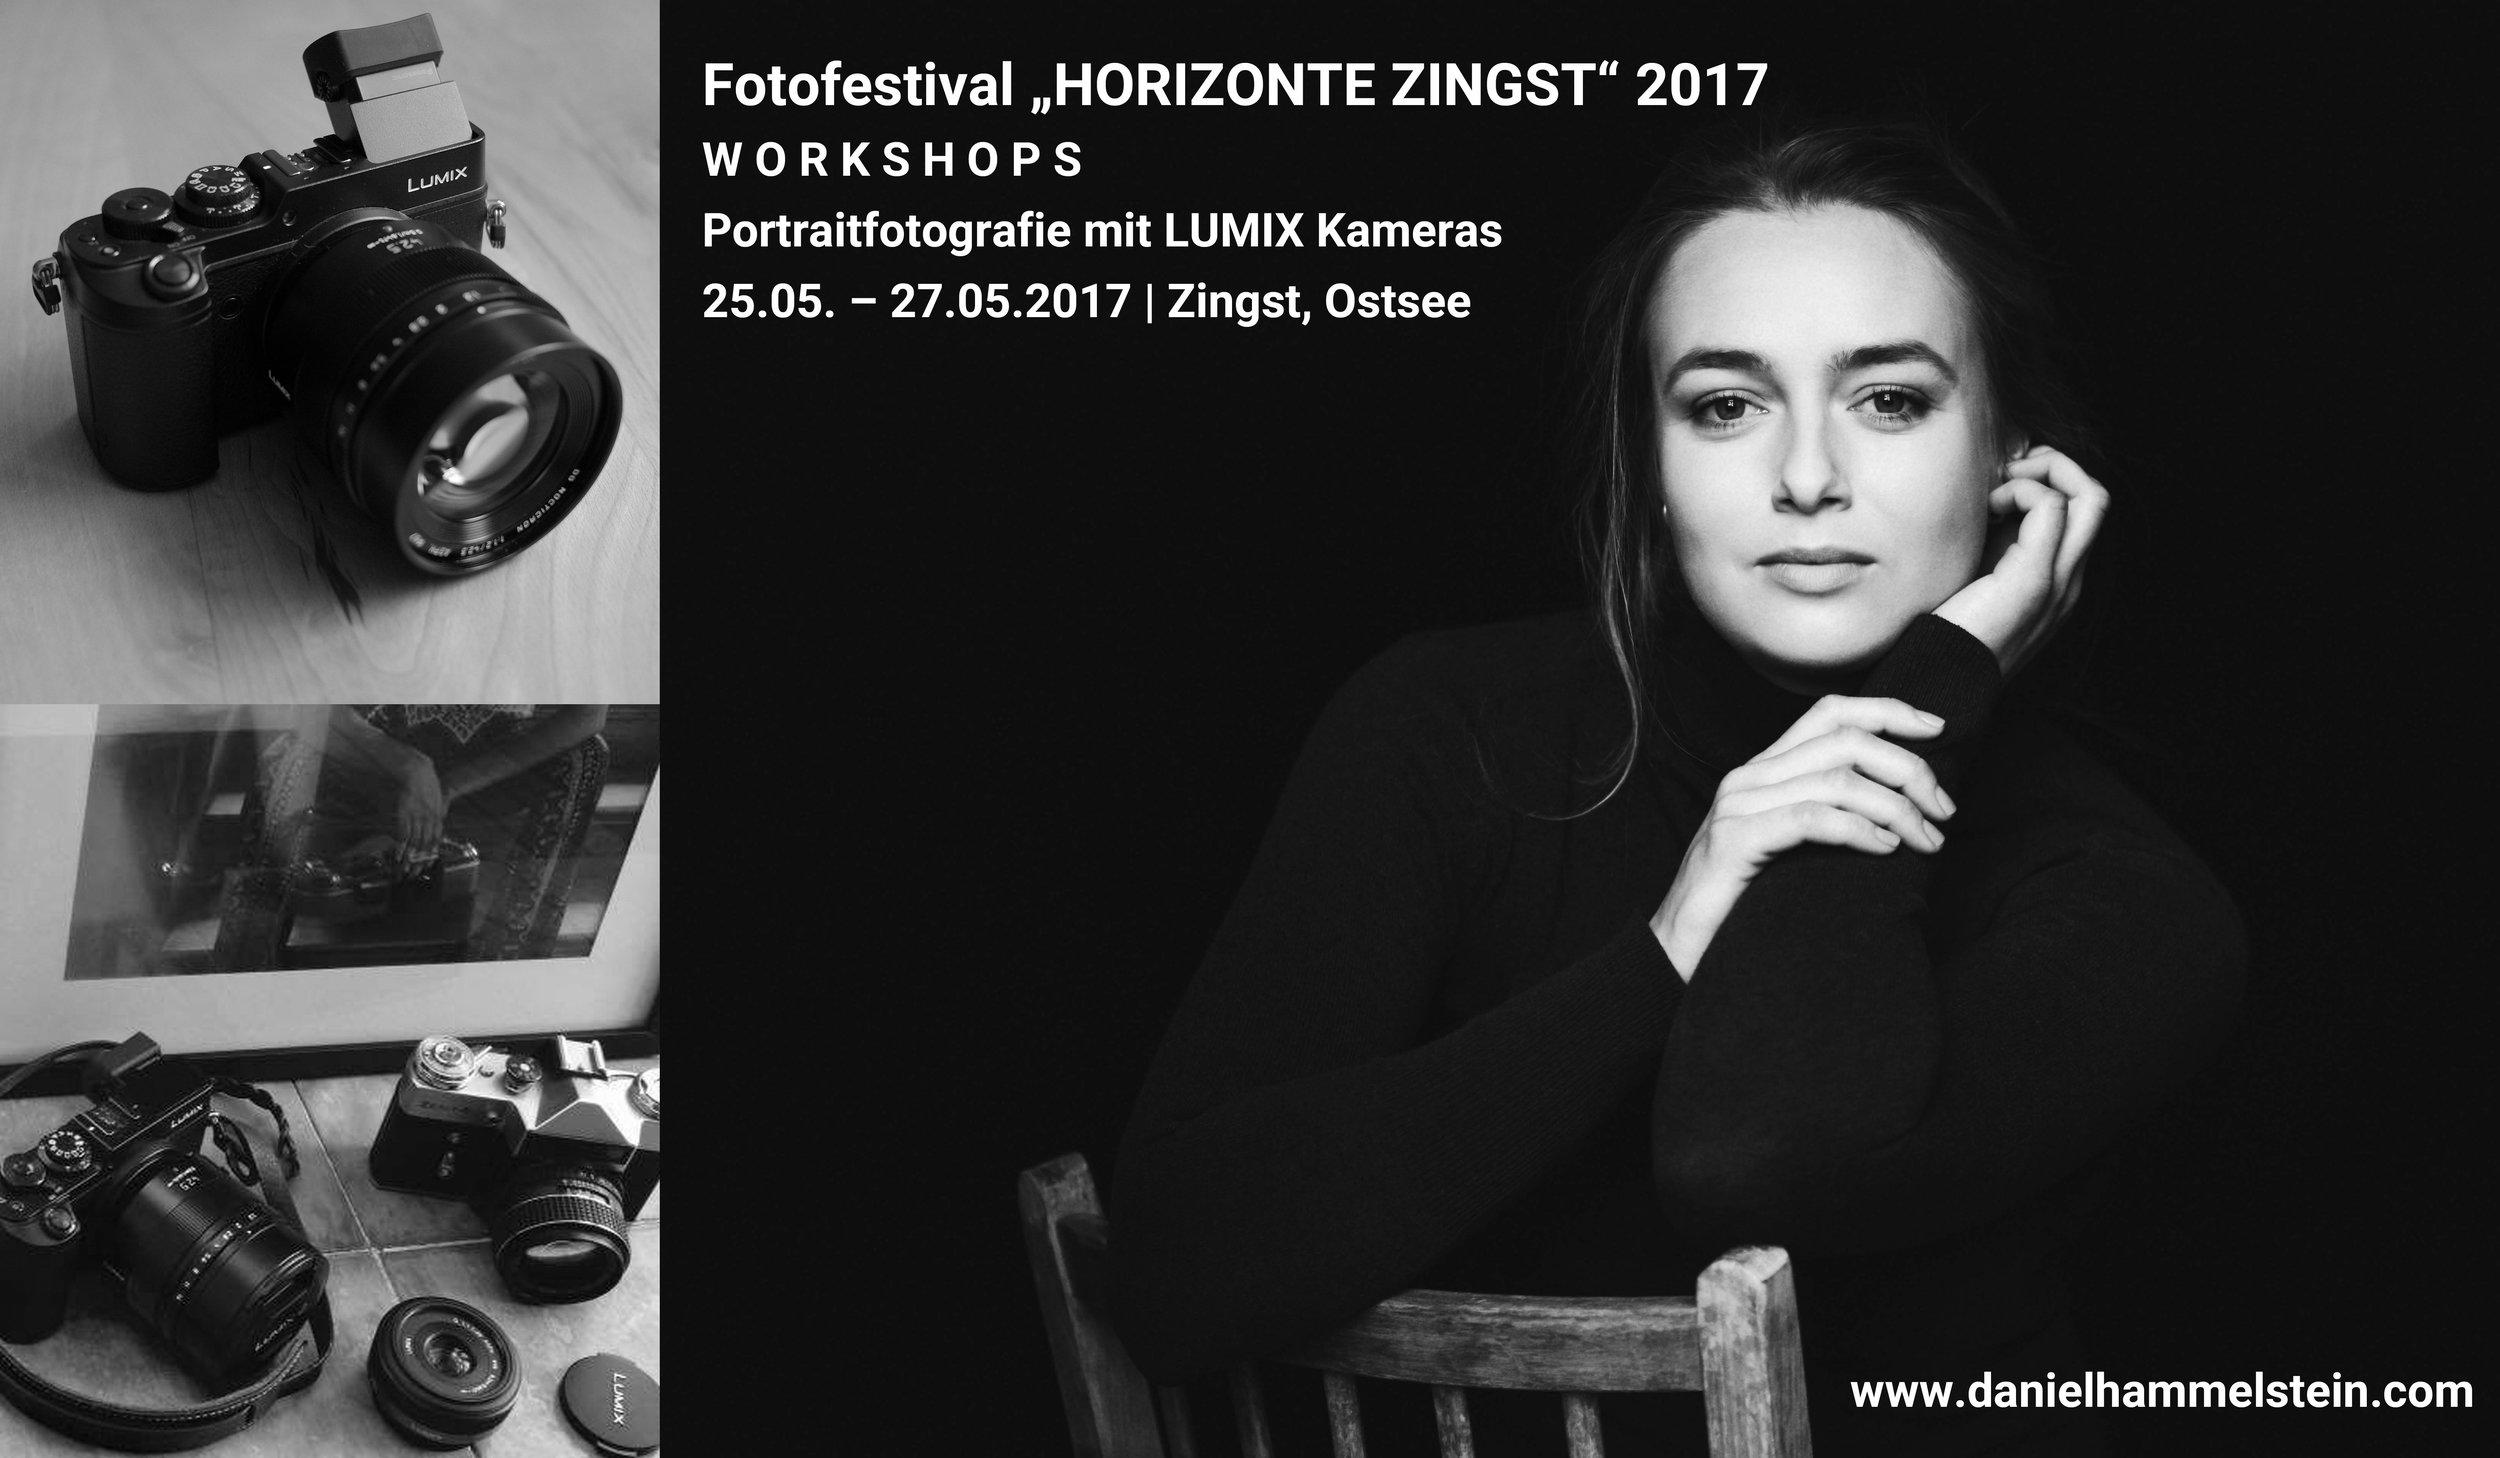 Fotografie Workshop Zingst Fotofestival Portraitfotografie LUMIX.jpg